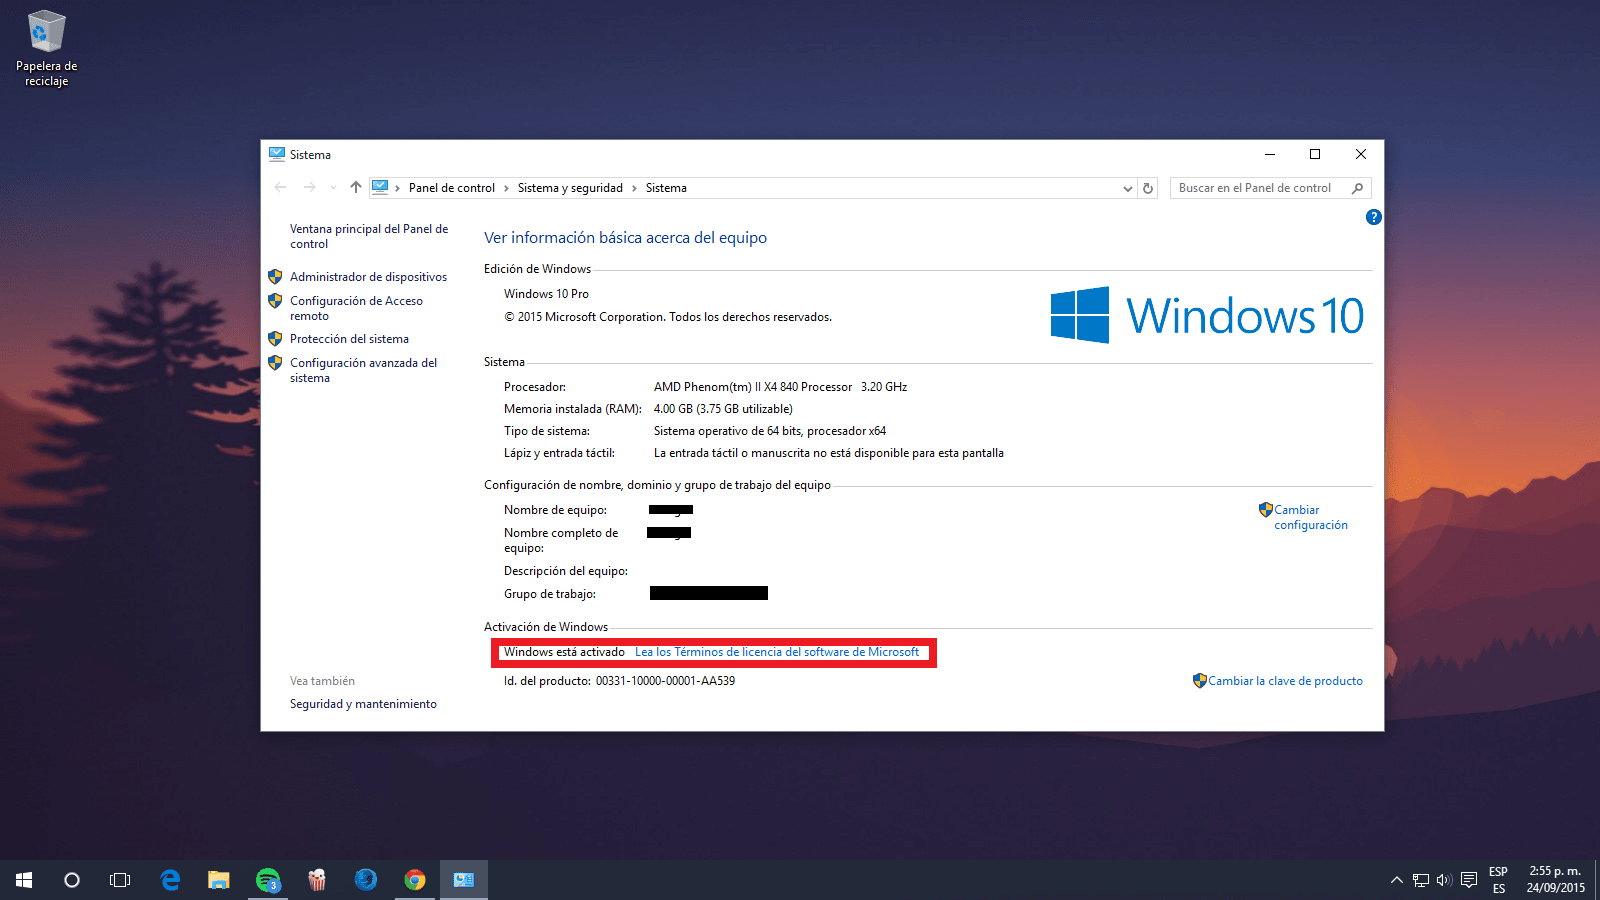 Como activar Windows 10 gratis